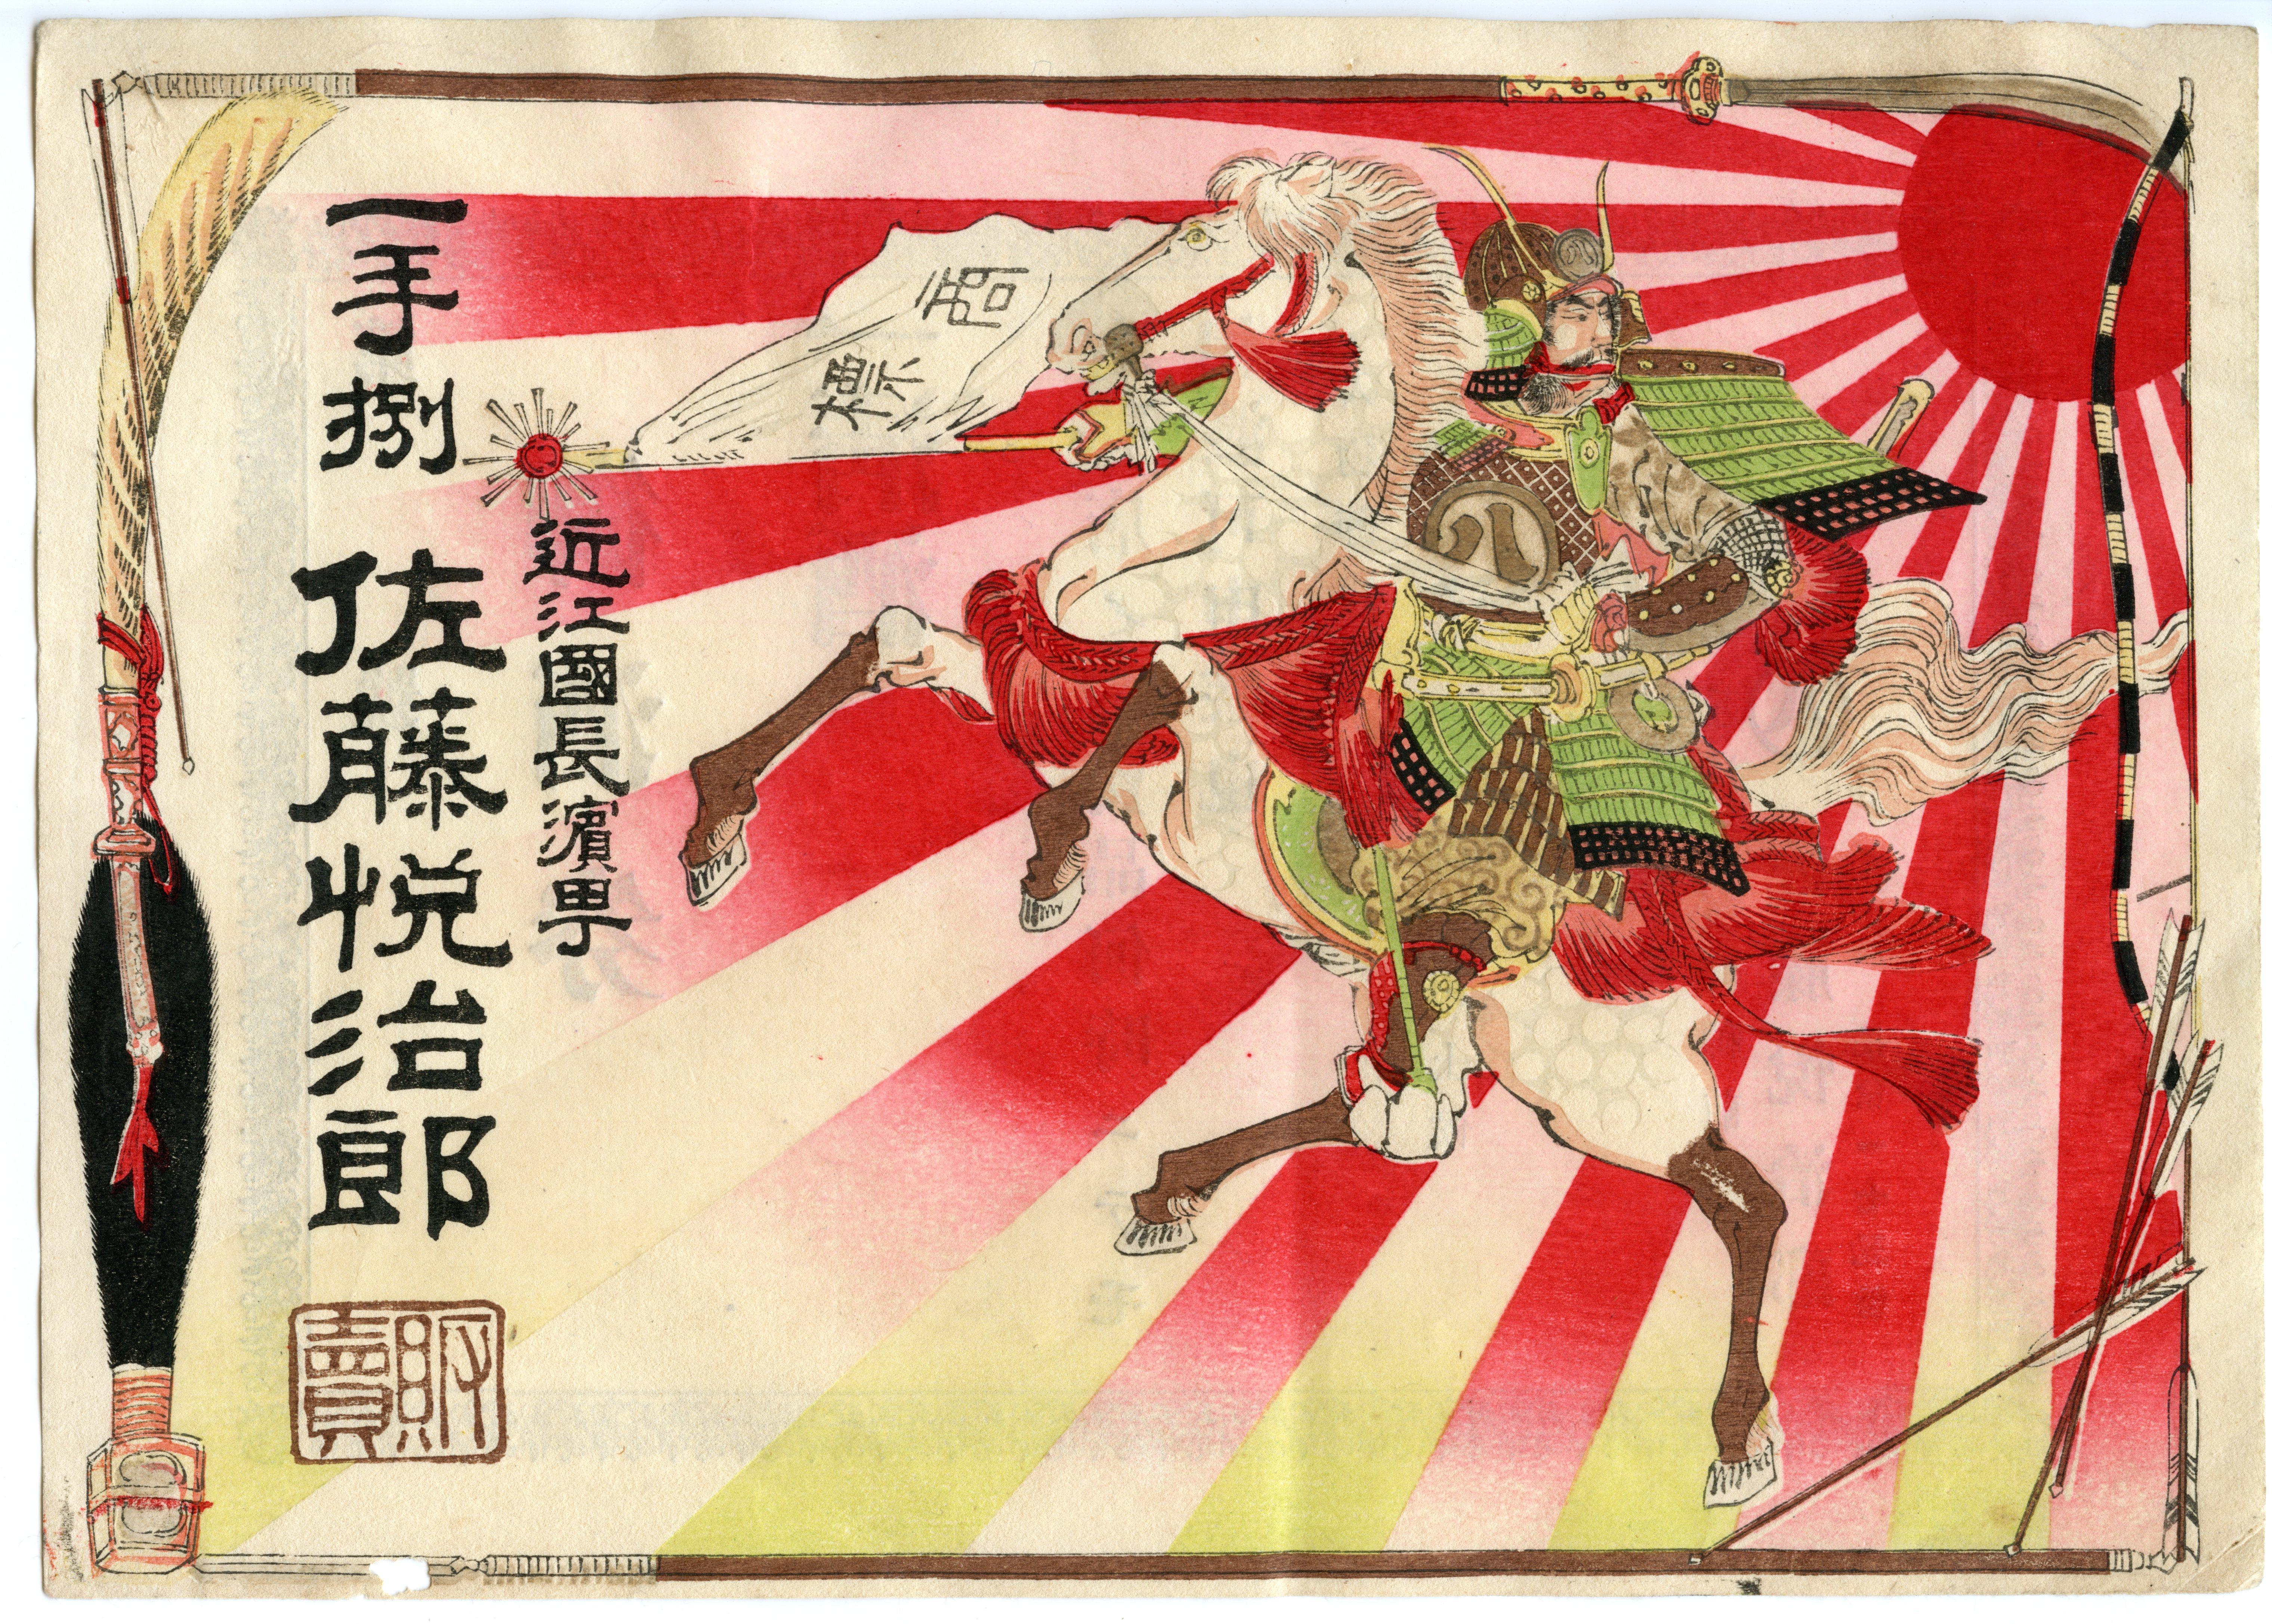 file sake gift certificate samurai woodblock print jpg wikimedia